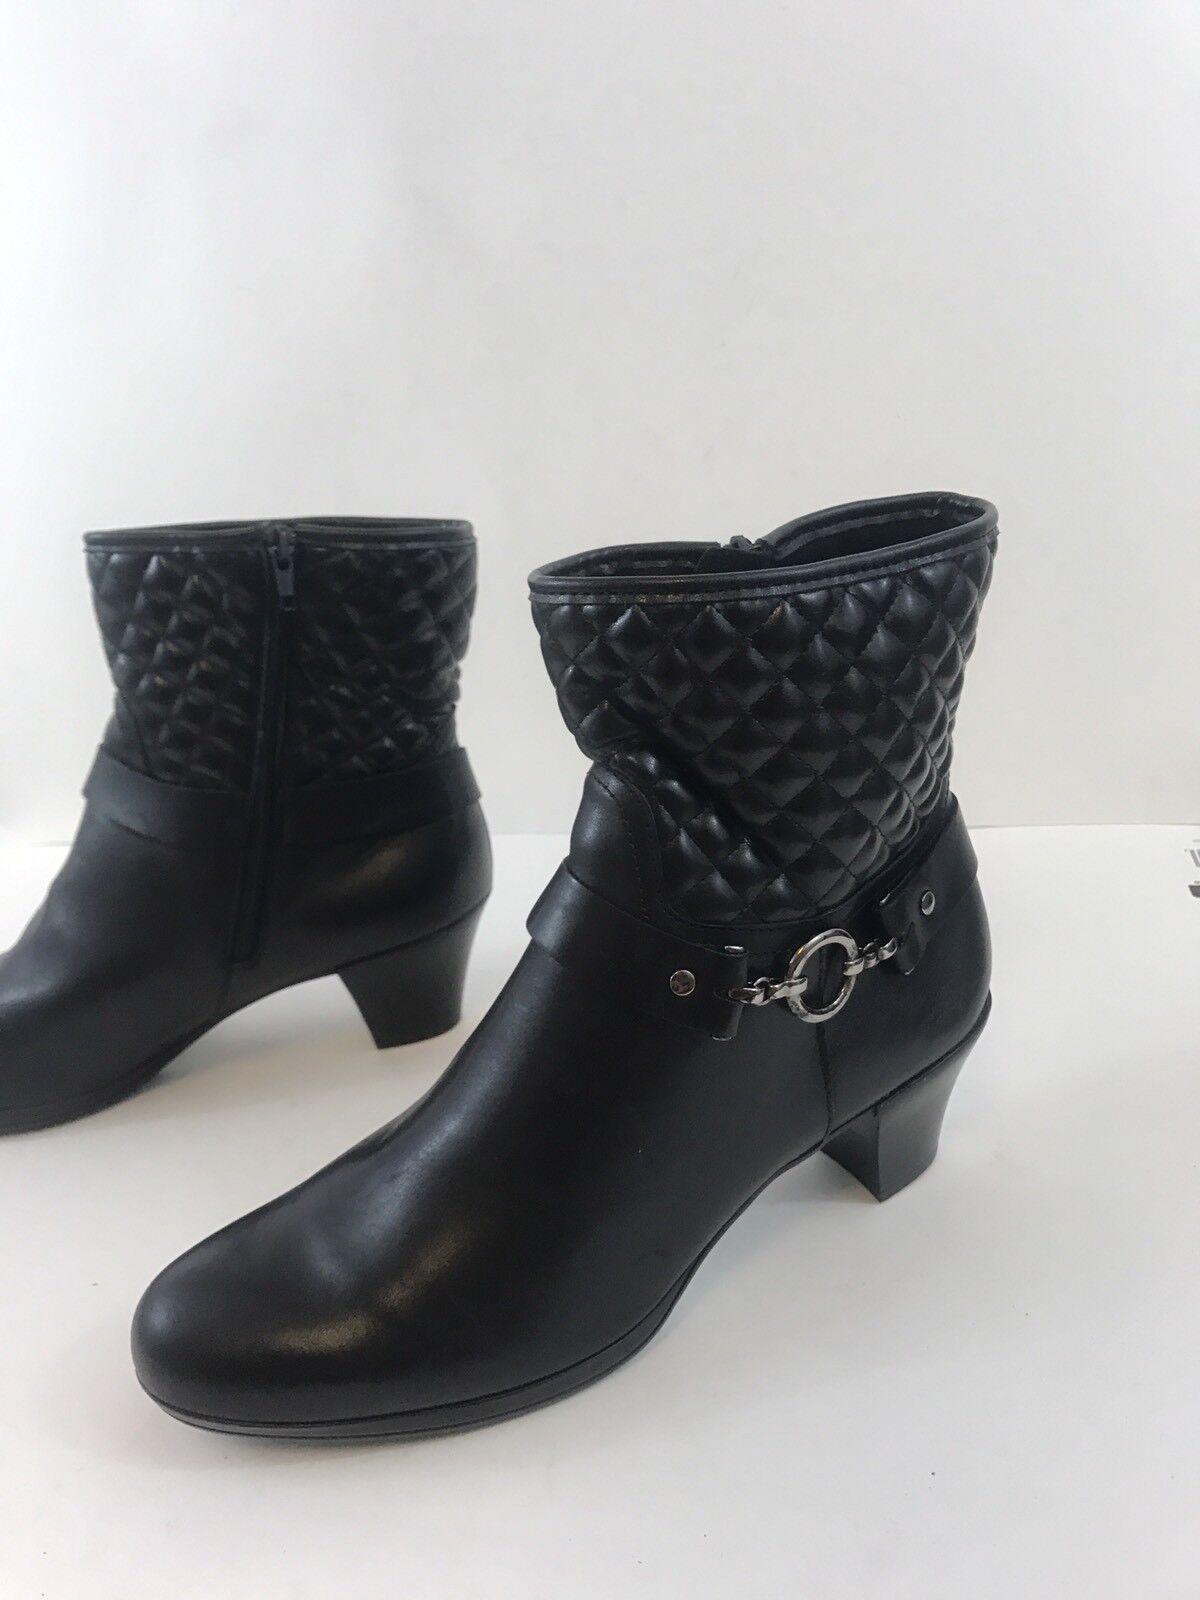 Munro American Laconia Acolchado Negro botas botas botas al tobillo Botines Talla 10 M  13 040063